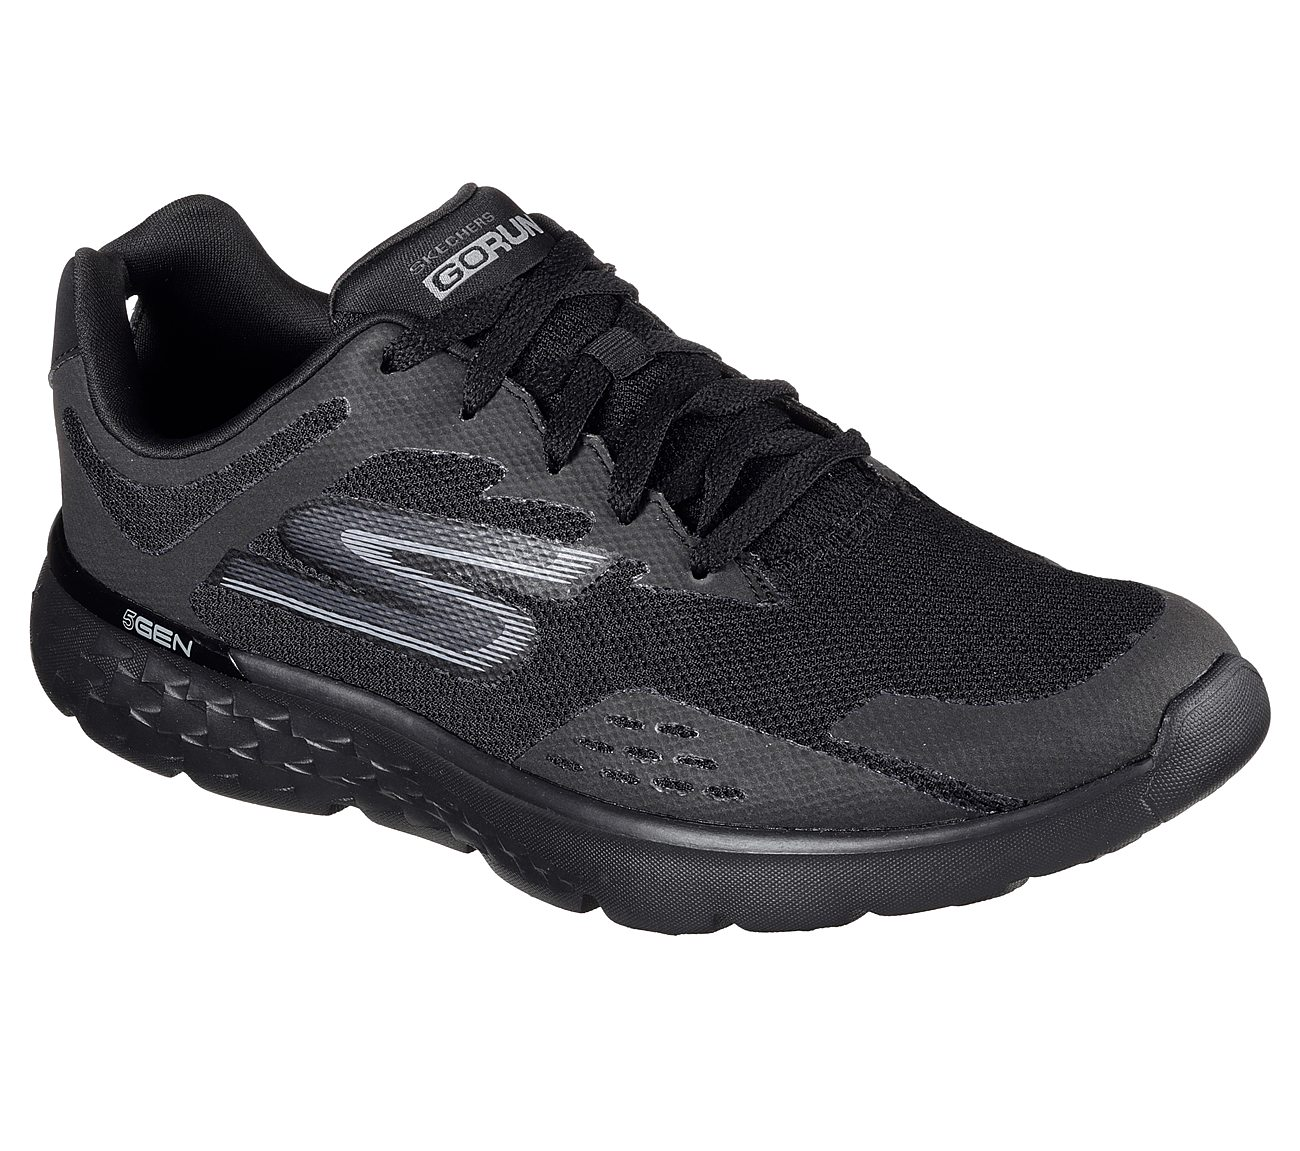 14ca29a4ef Exclusive SKECHERS Homens shoes - SKECHERS Brasil